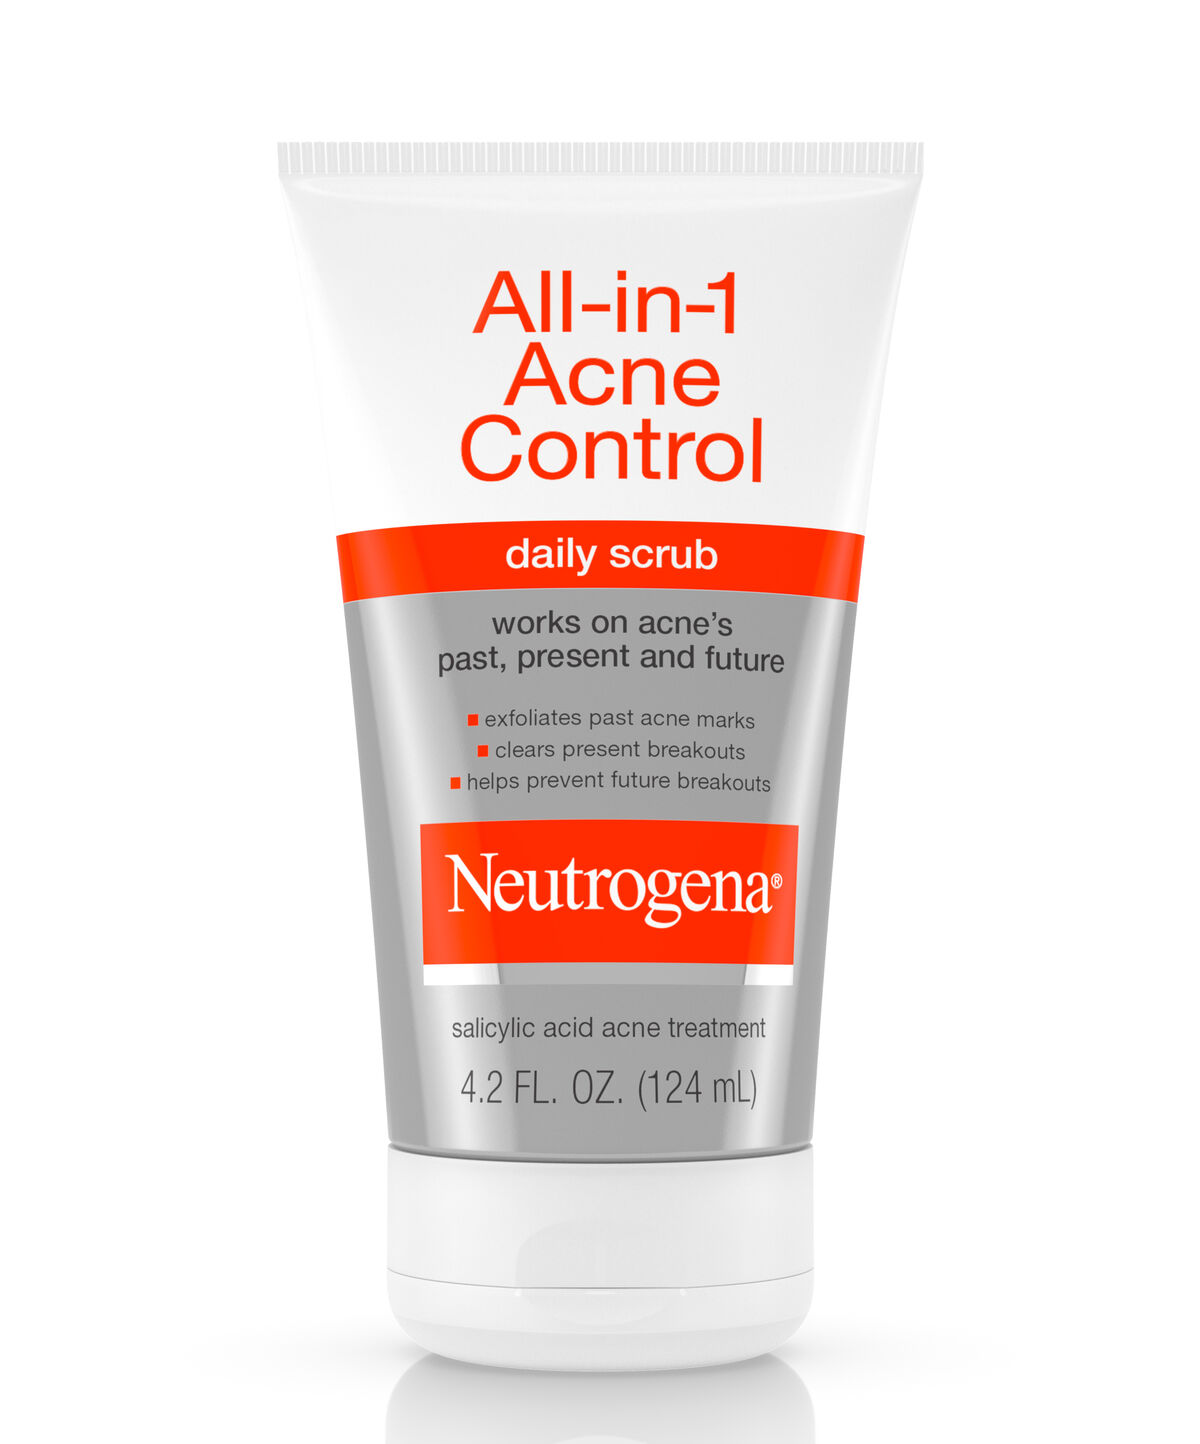 All in 1 acne control daily scrub neutrogena neutrogena all in 1 acne control daily scrub ccuart Gallery